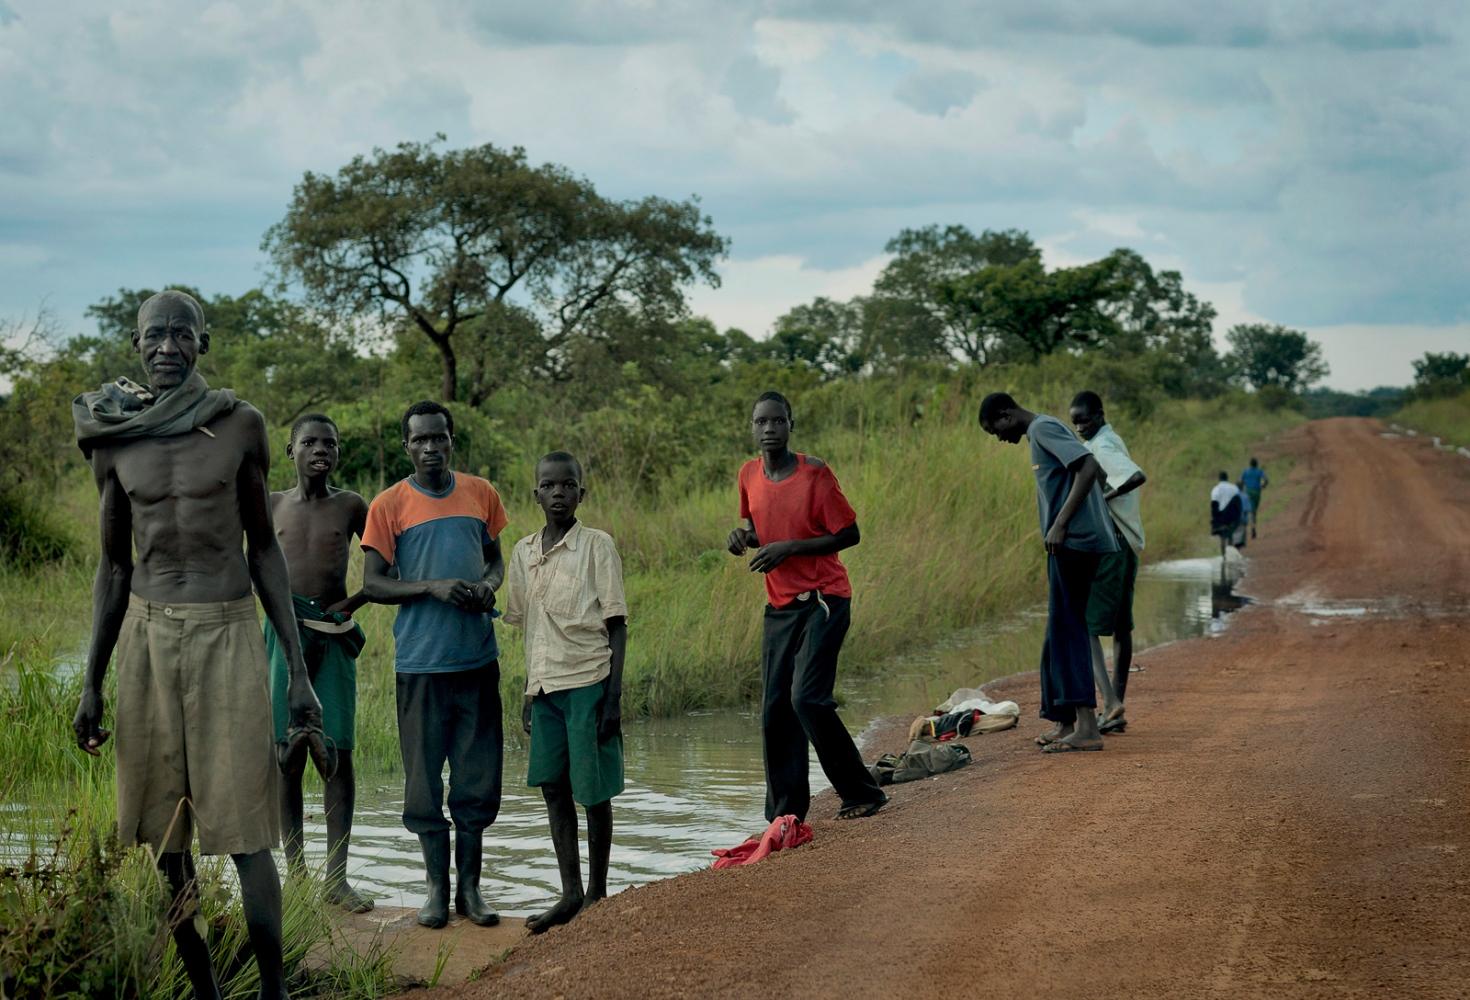 Gulu road, North Uganda